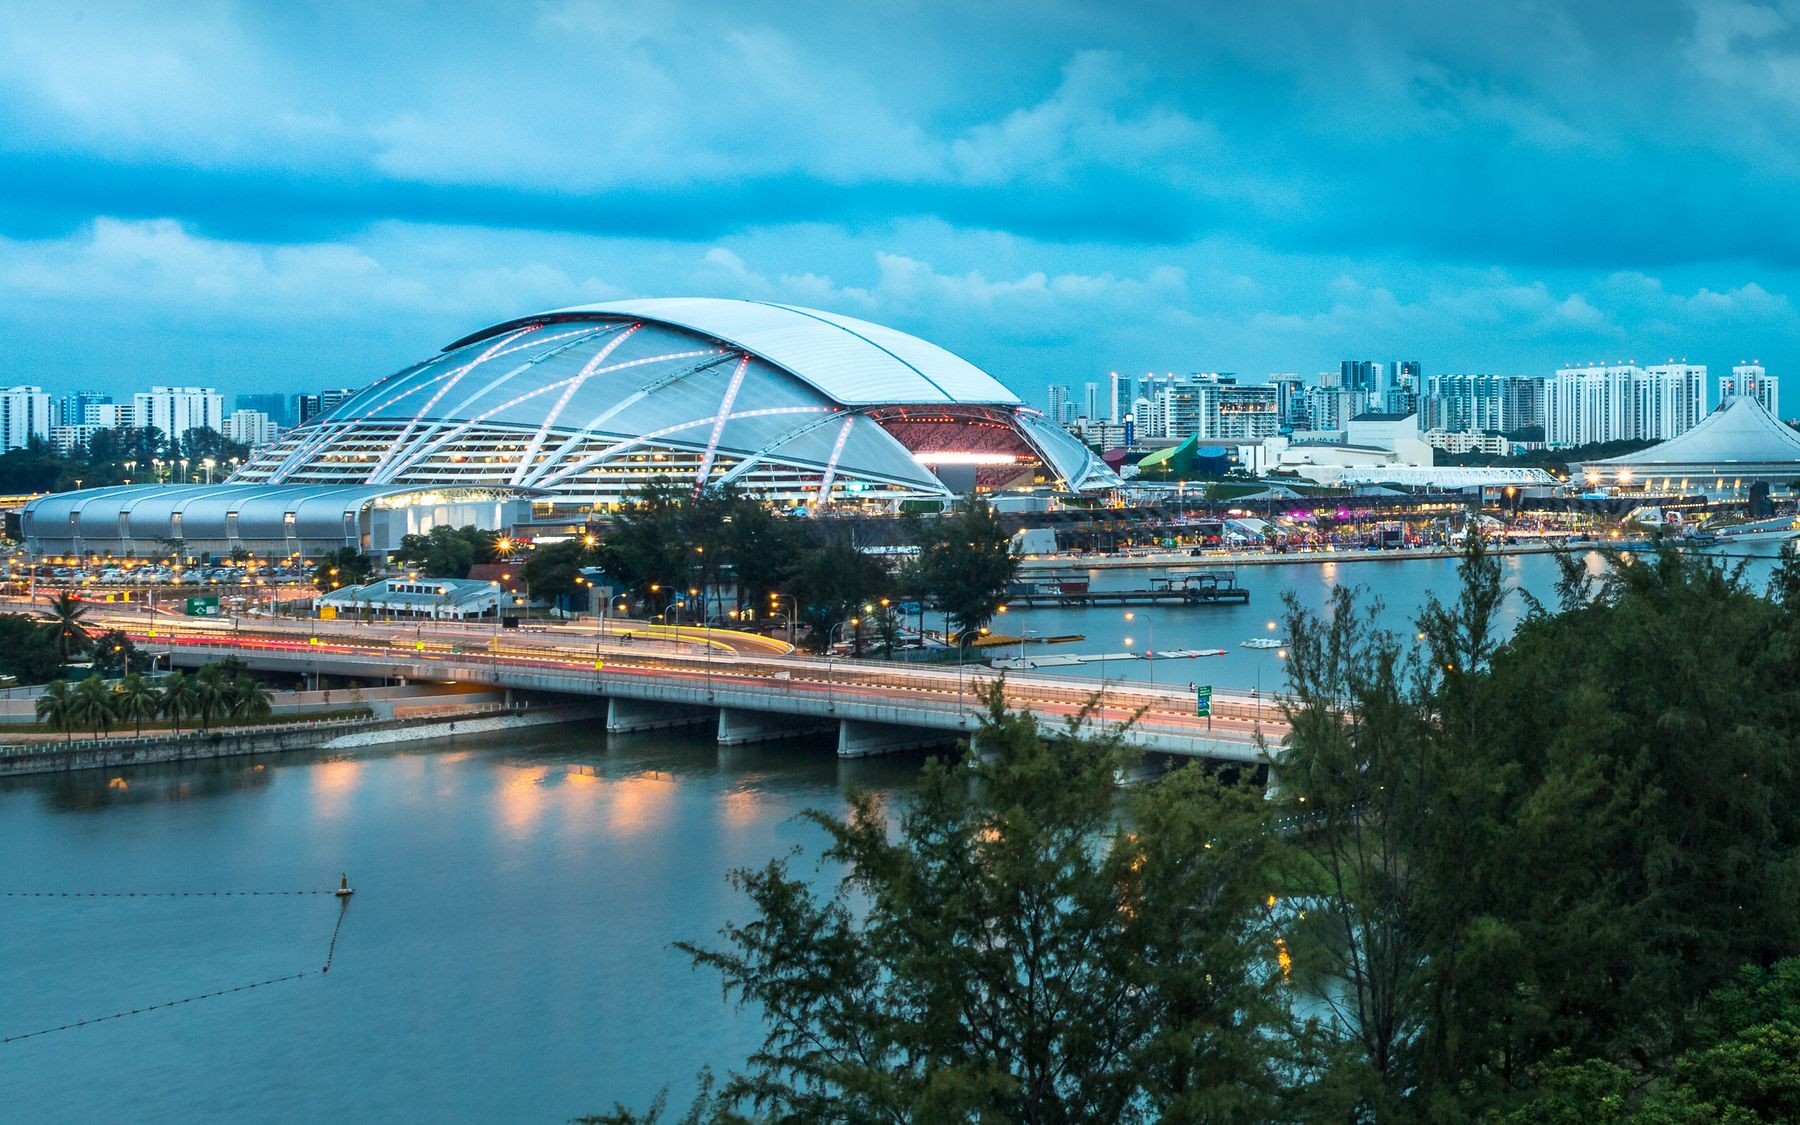 The Singapore Sports Hub at dusk